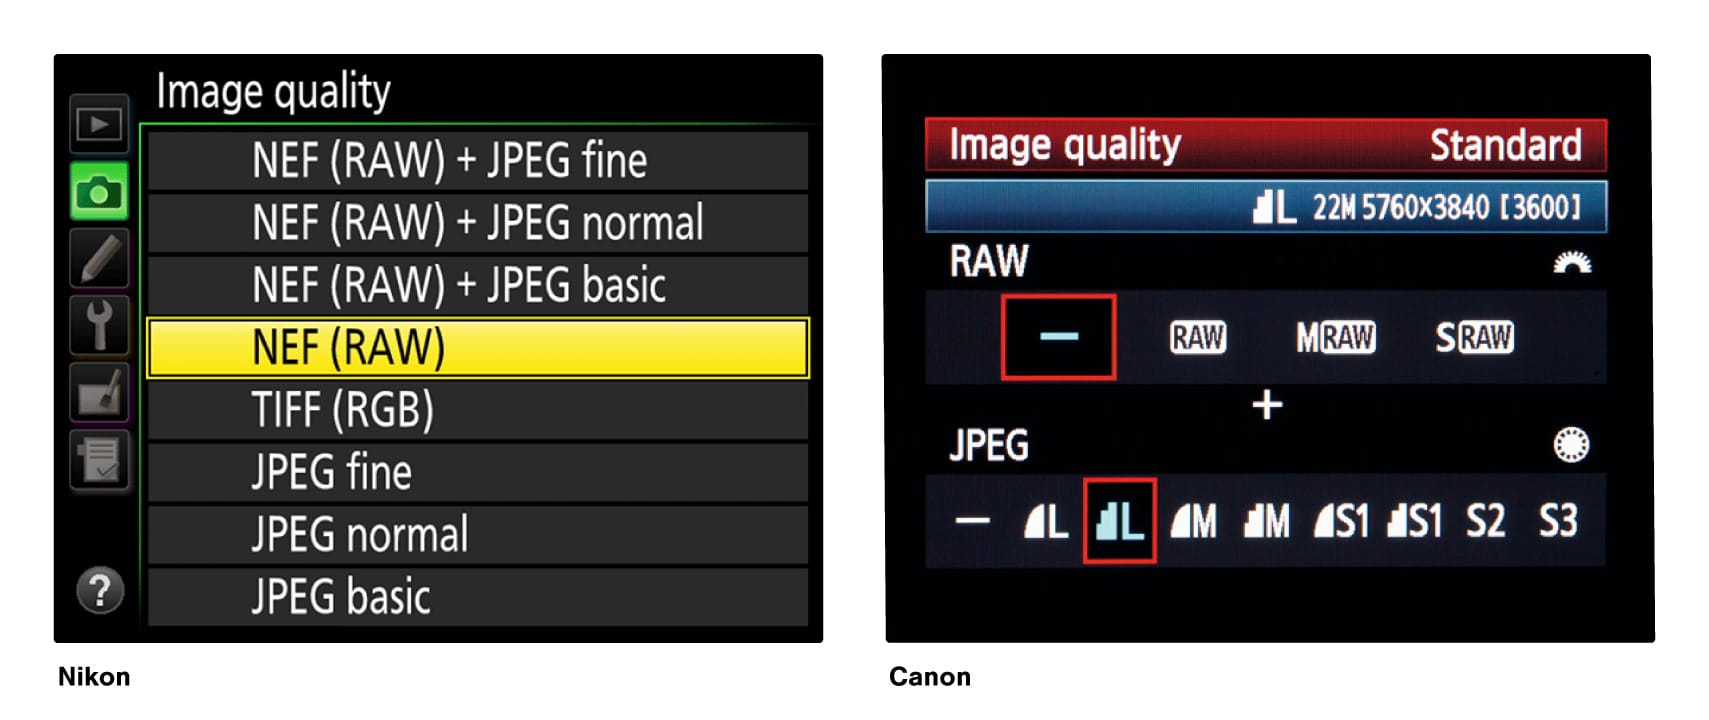 Nikon and Canon image file screens